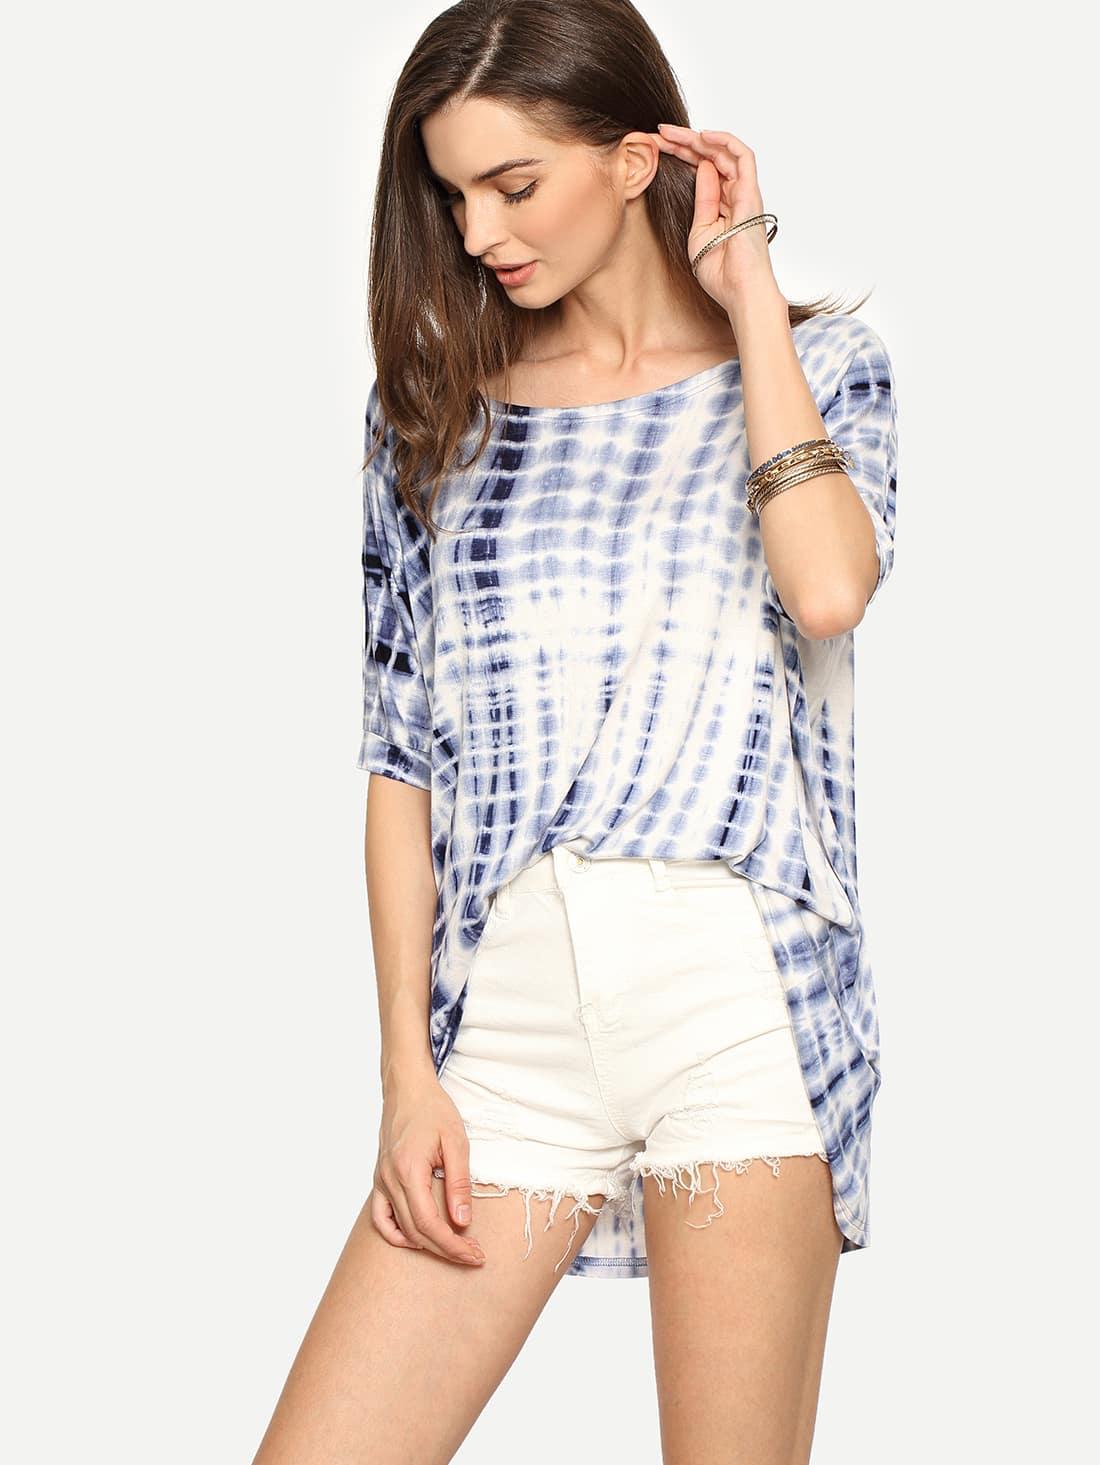 Multicolor Ikat Print Half Sleeve T-shirtMulticolor Ikat Print Half Sleeve T-shirt<br><br>color: Multi<br>size: L